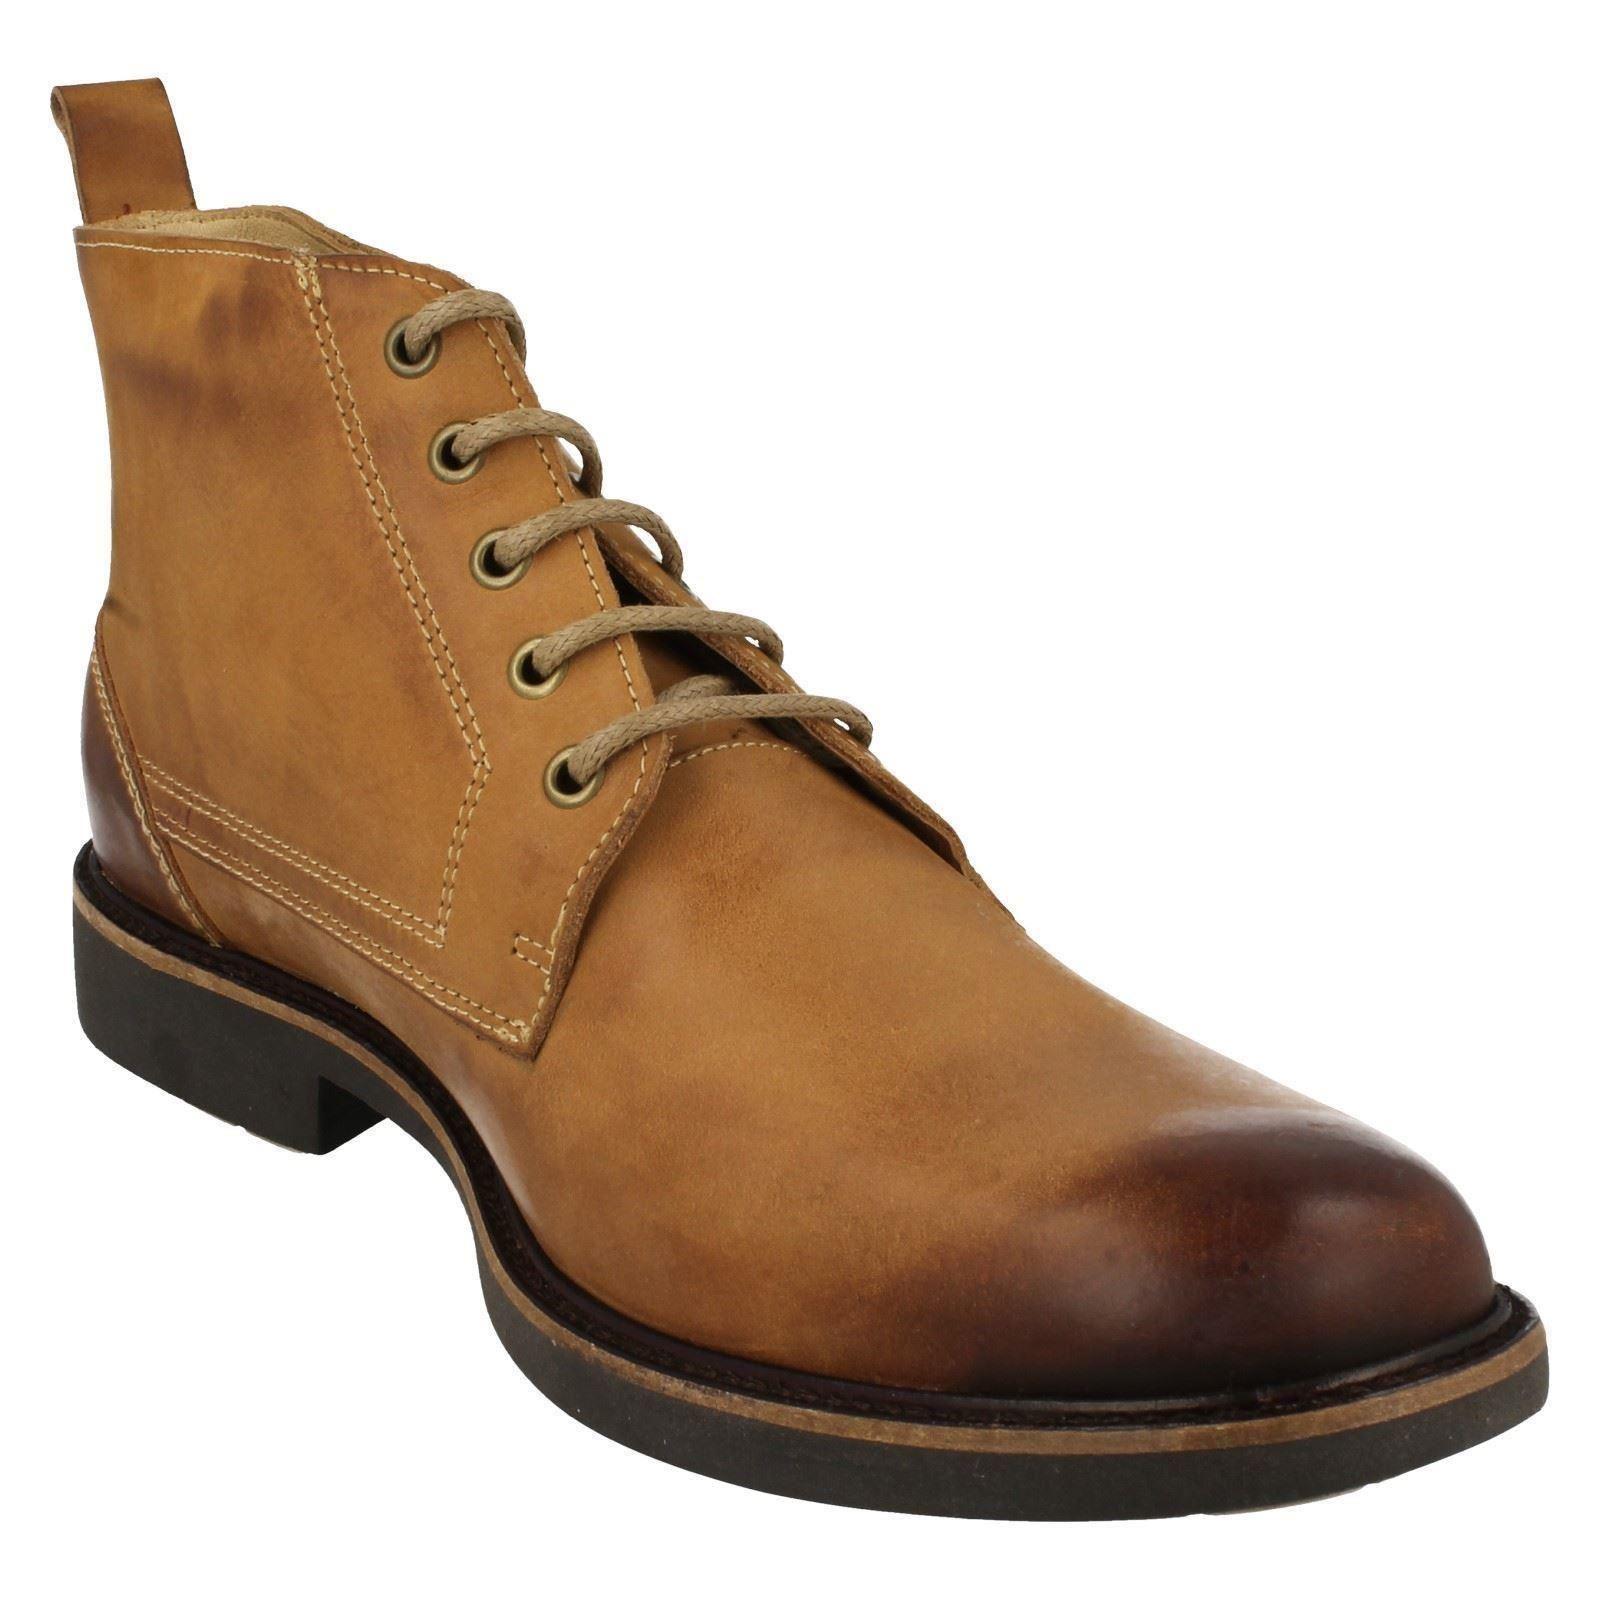 Mens Anatomic Smart Ankle Ankle Smart Stiefel 'Pedras' cb631a